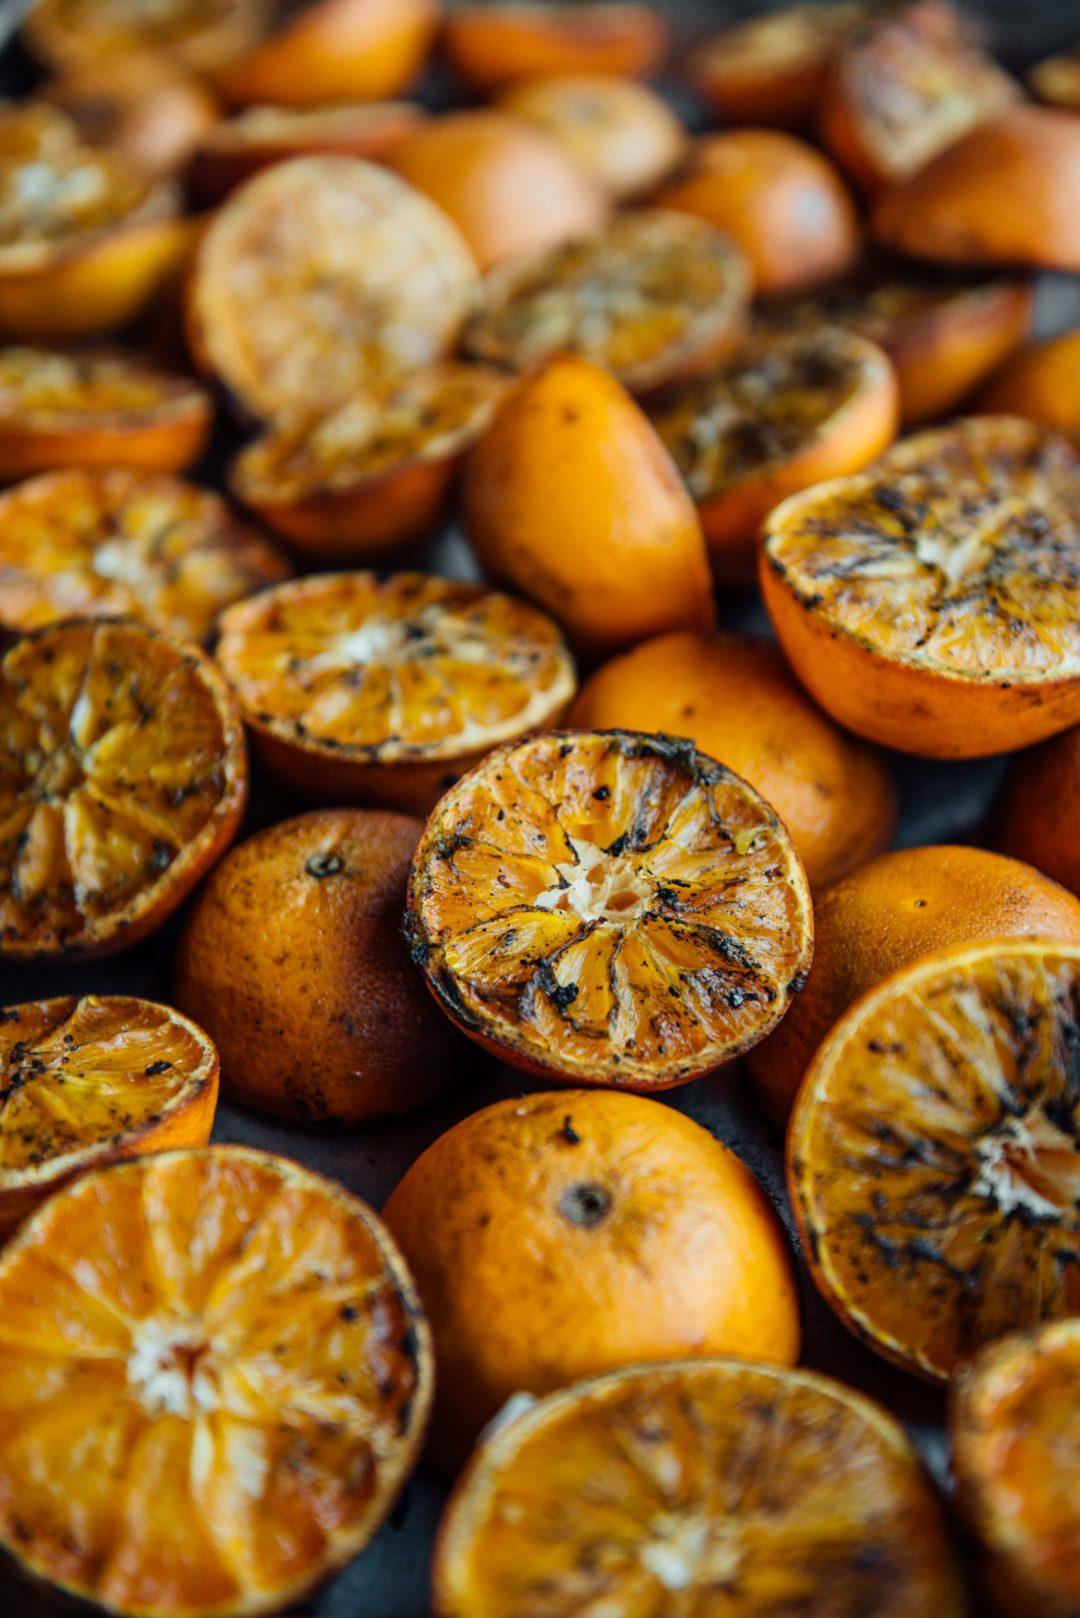 Smoked Oranges